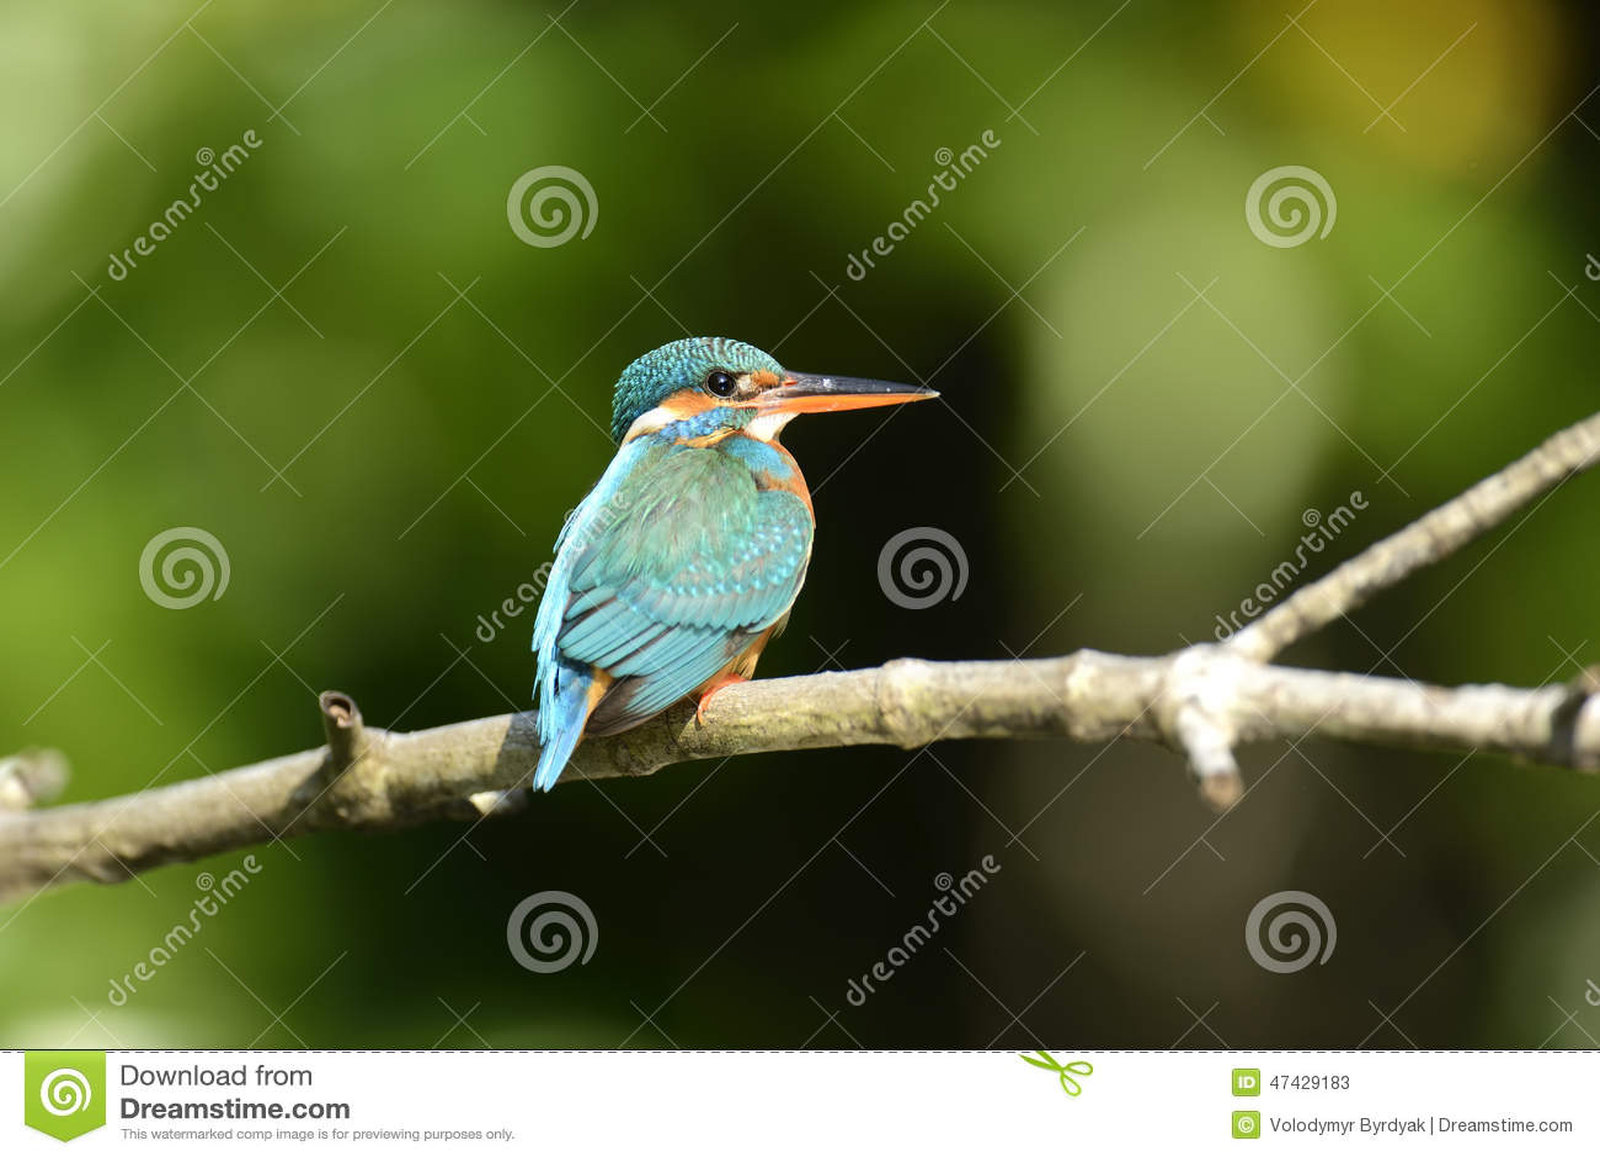 Blue Kingfisher Bird Stock Photo